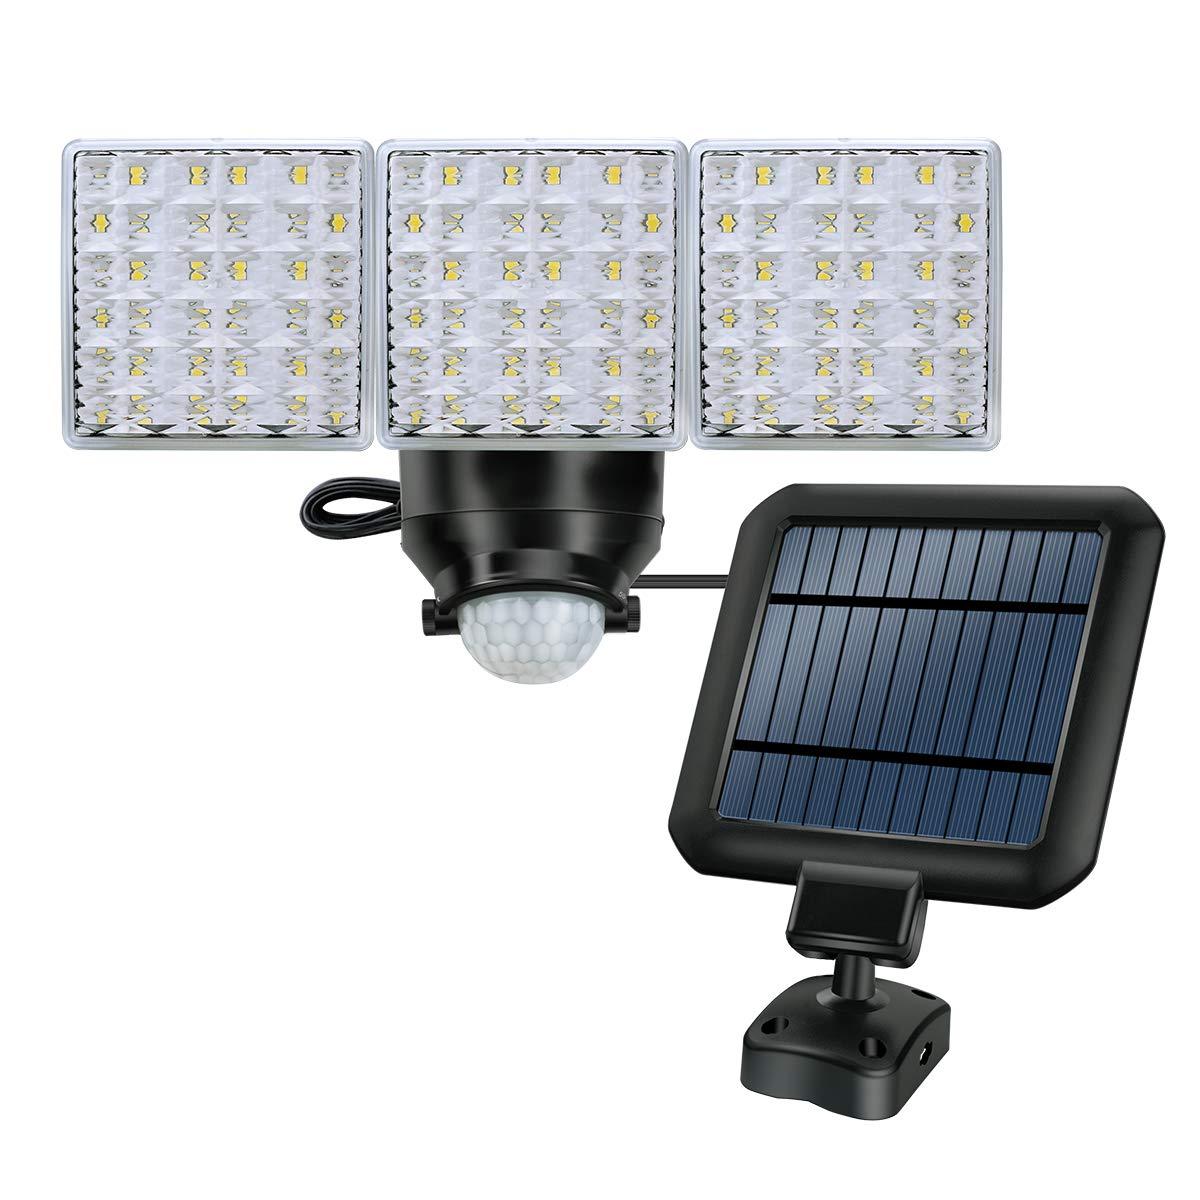 Solar LED Security Light, STASUN Triple Head 1800lm Motion Sensor Light with Wide Lighting Angle, 5000K, Adjustable Head, Waterproof Outdoor Flood Light for Front Door, Yard, Garage, Deck by STASUN